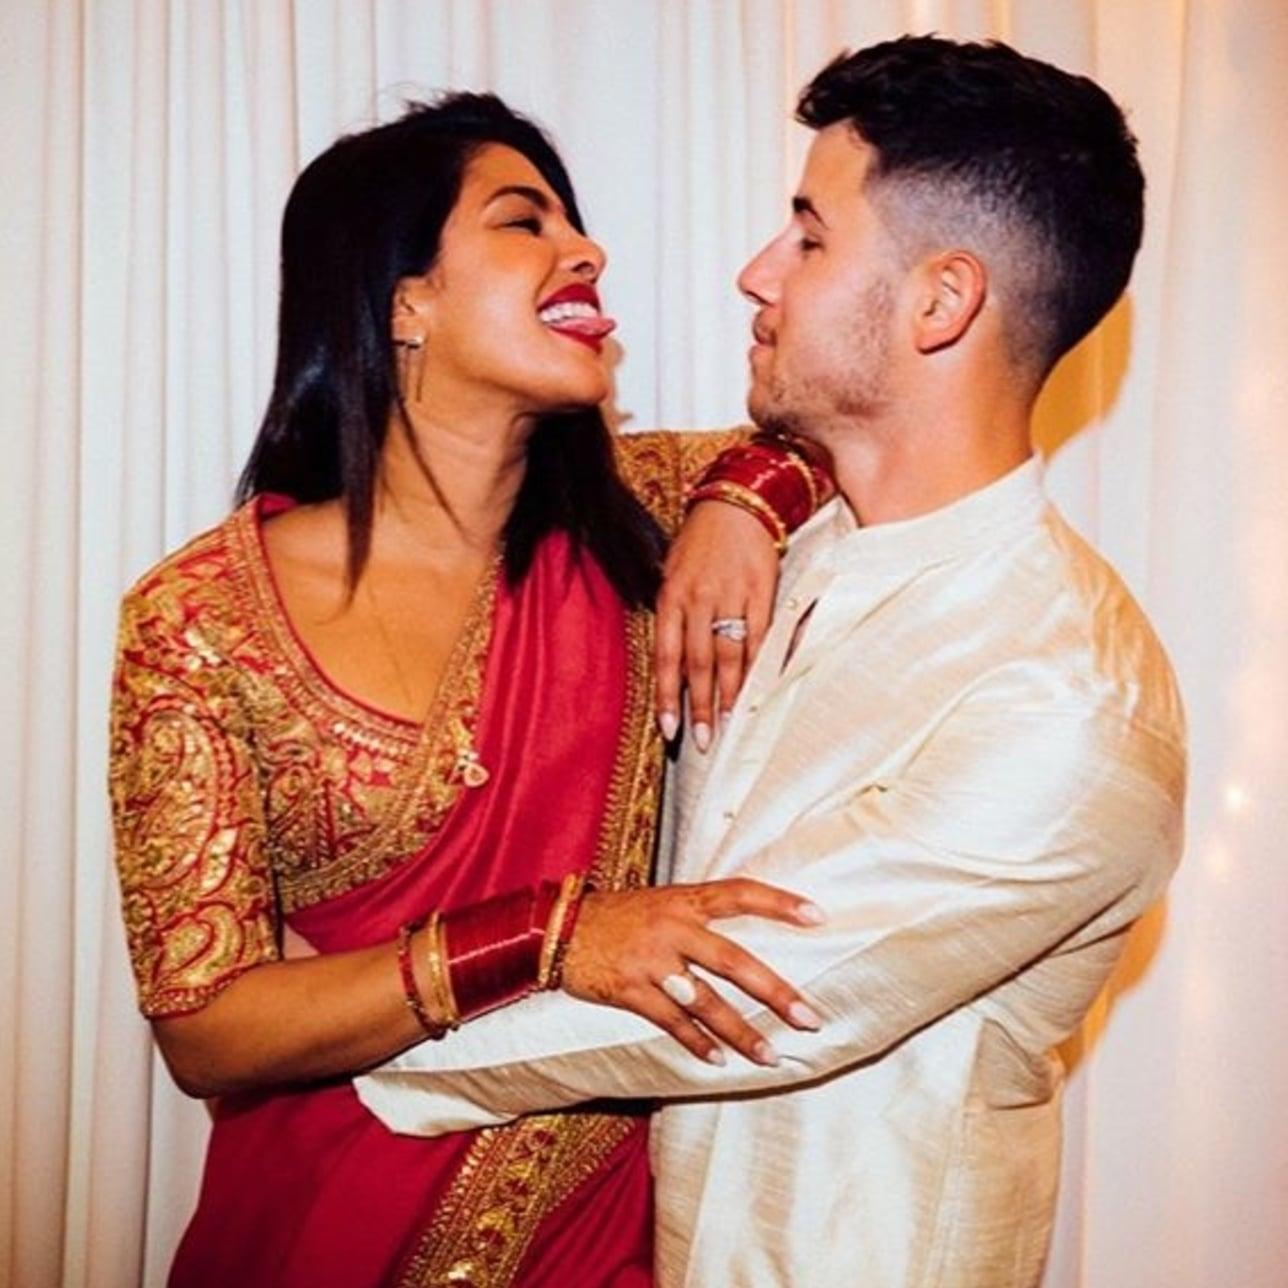 Image result for Priyanka Chopra and Nick Jonas